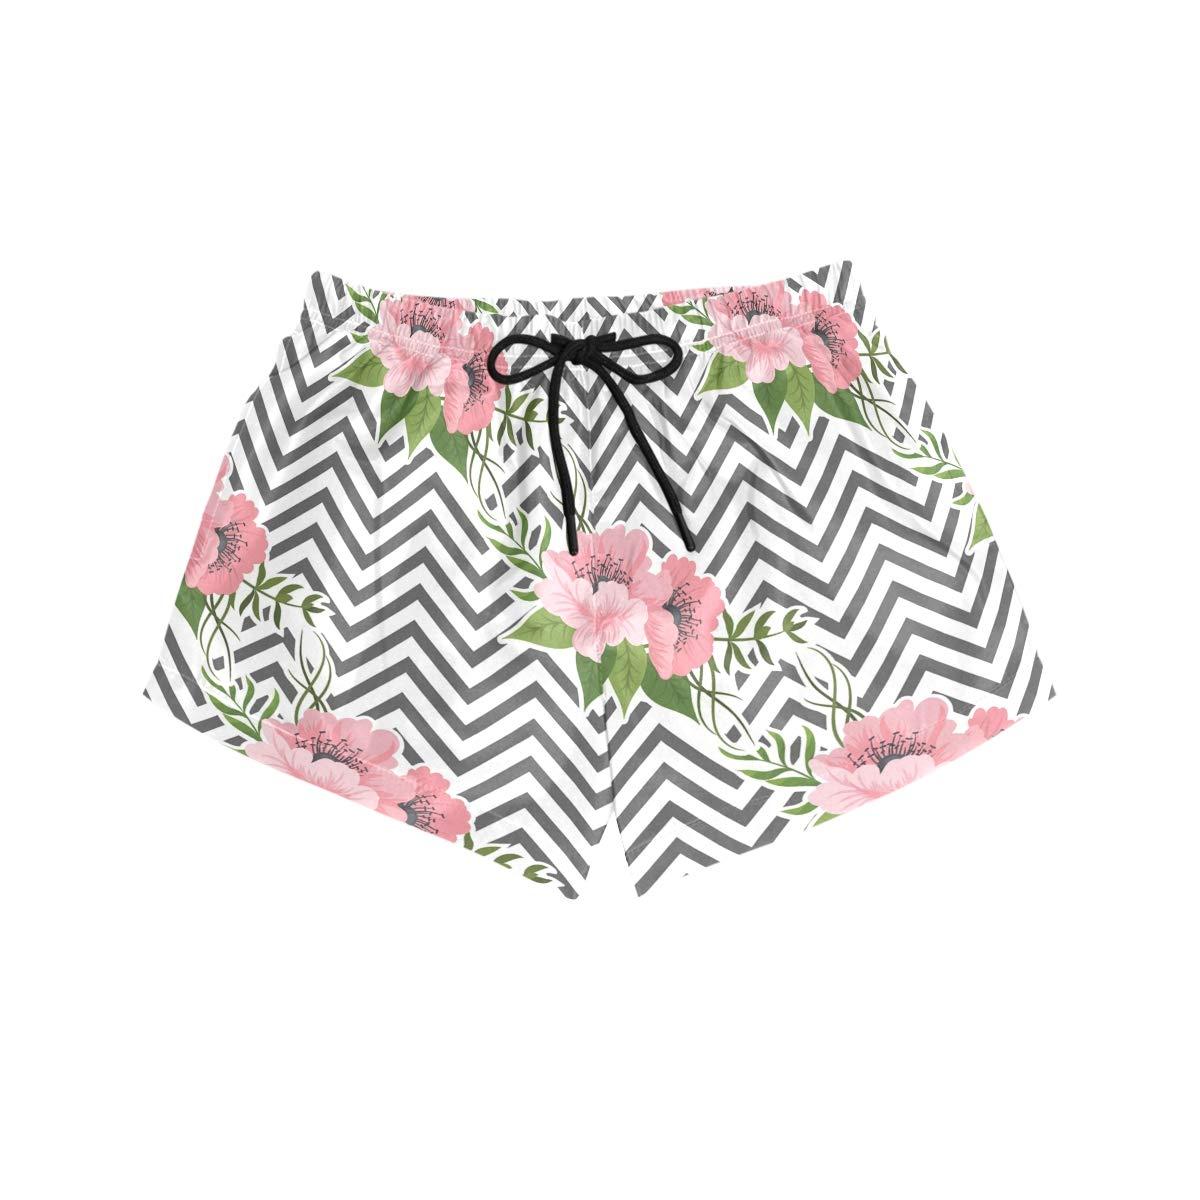 CENHOME Women Swim Trunks Pink Flowers Black White Zigzag Stripes Beach Board Shorts